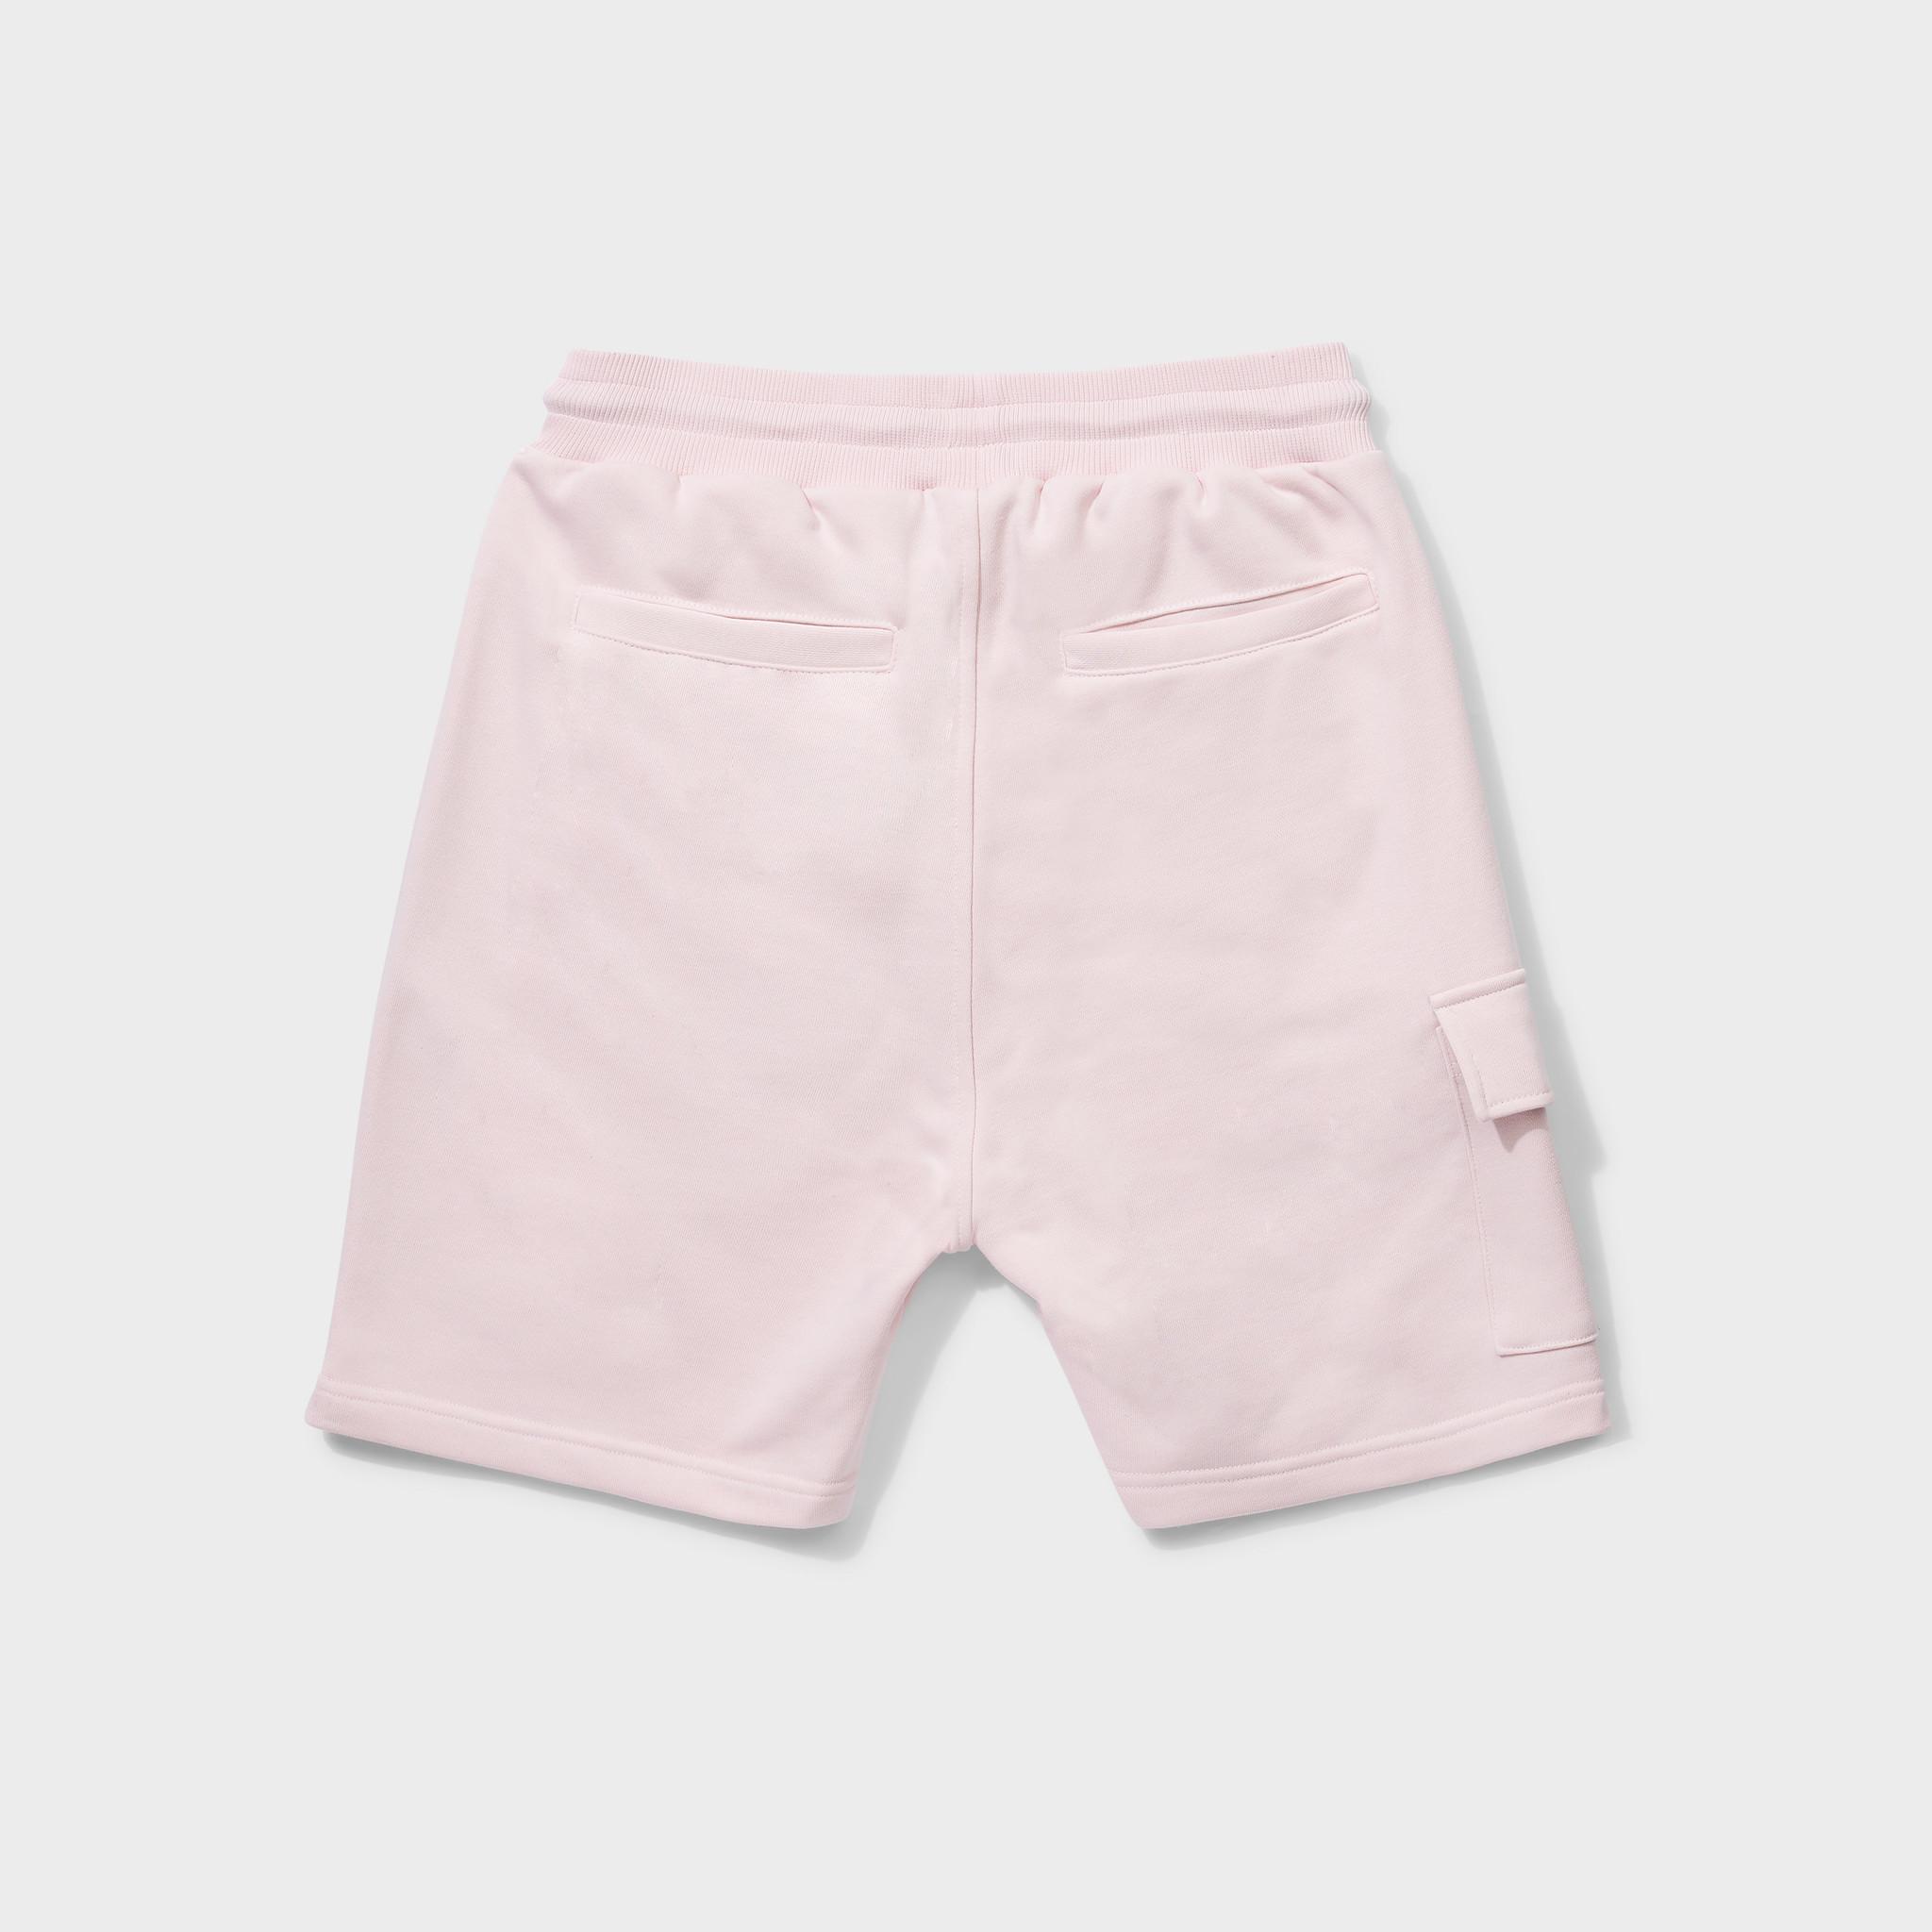 Travis shorts pink-2